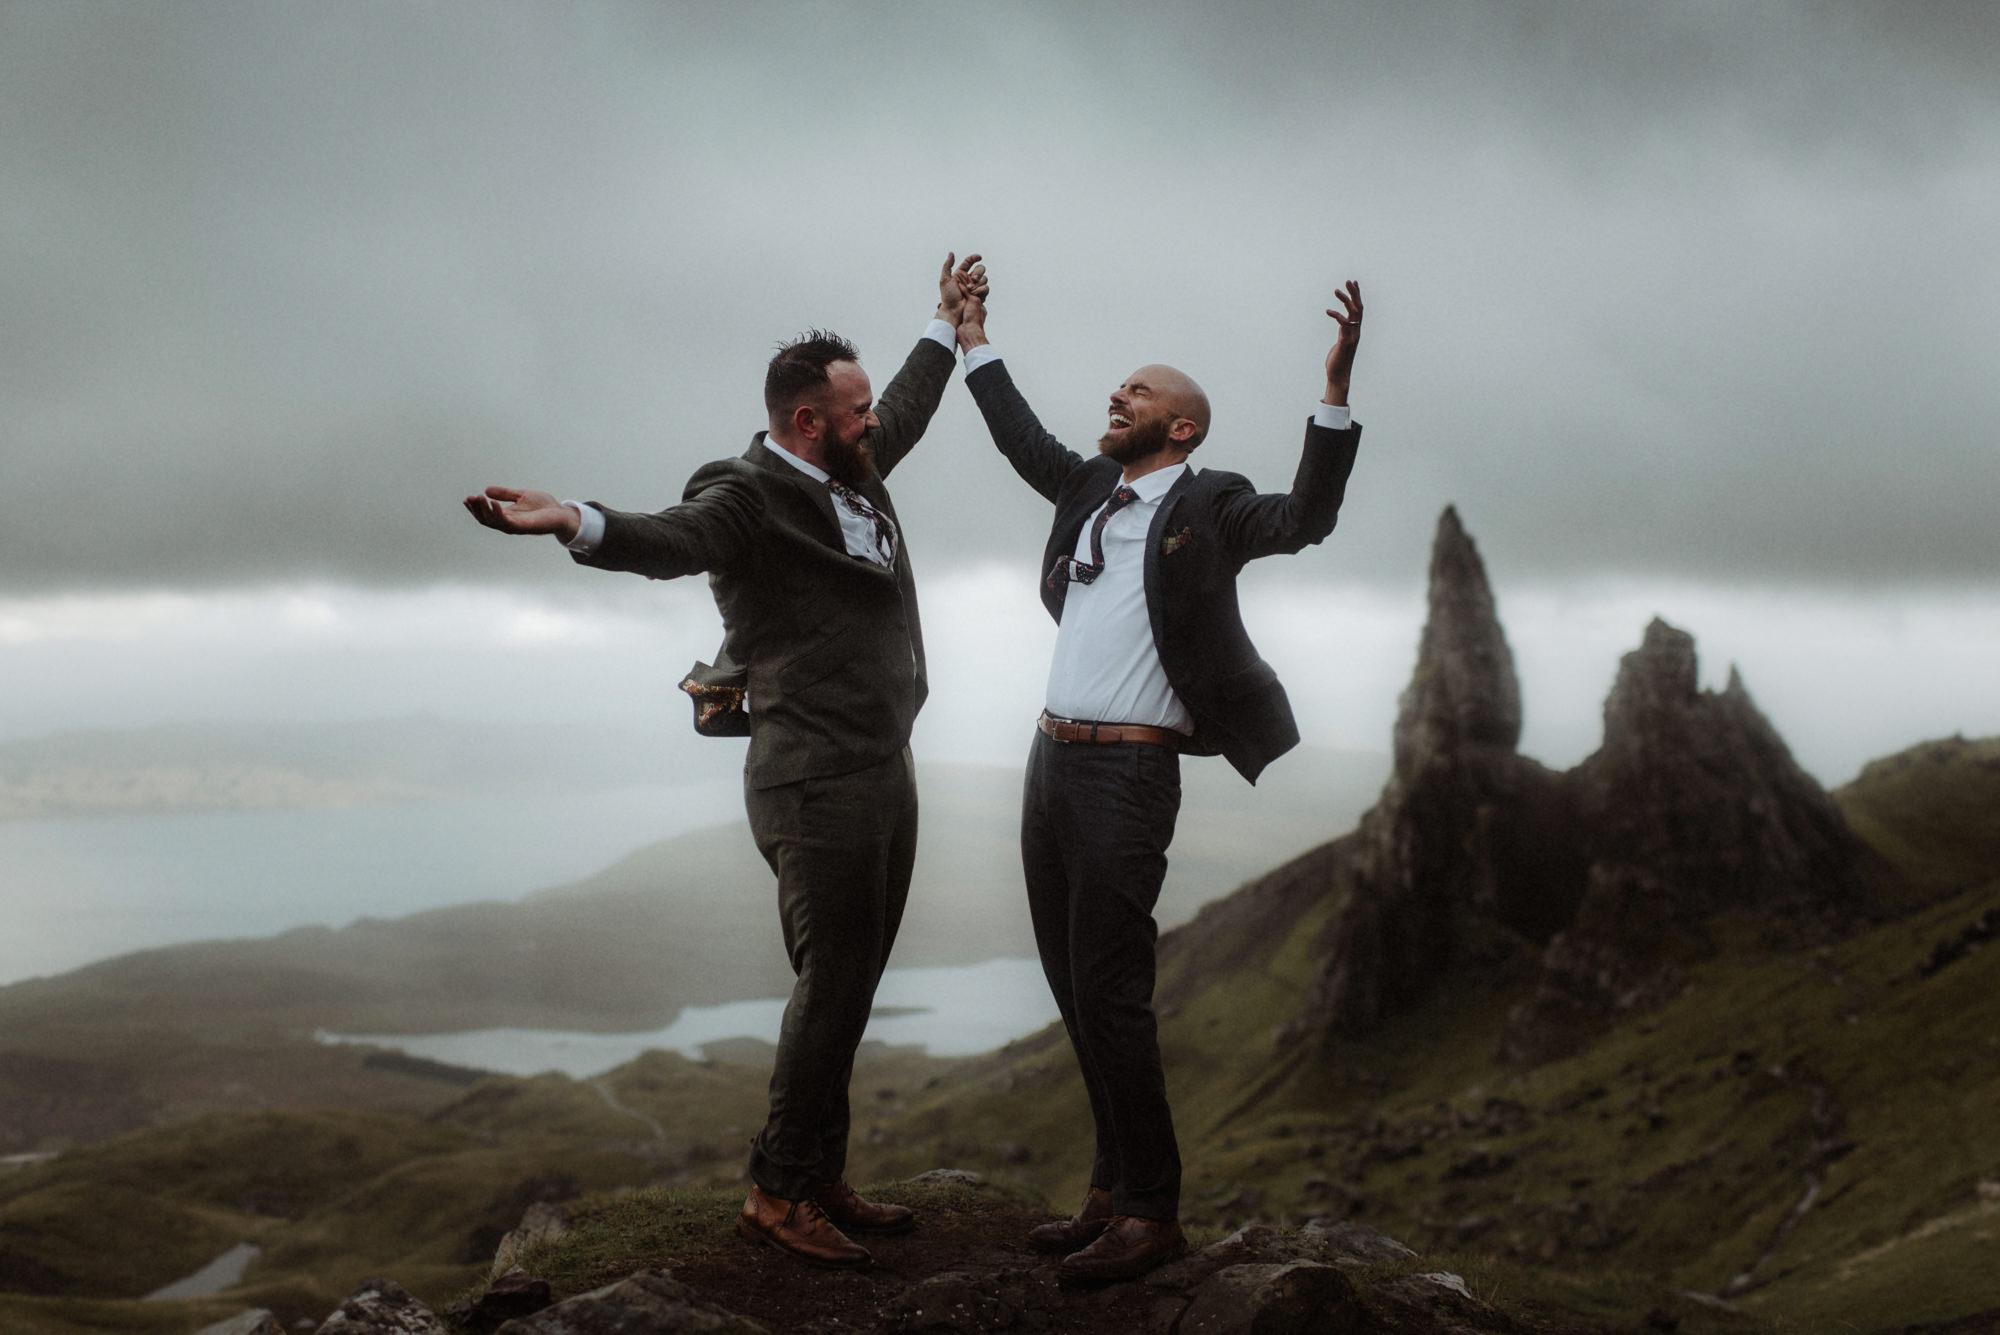 grooms-celebrate-elopement-on-mountain-top-worlds-best-wedding-photos-the-kitcheners-scotland-wedding-photographers